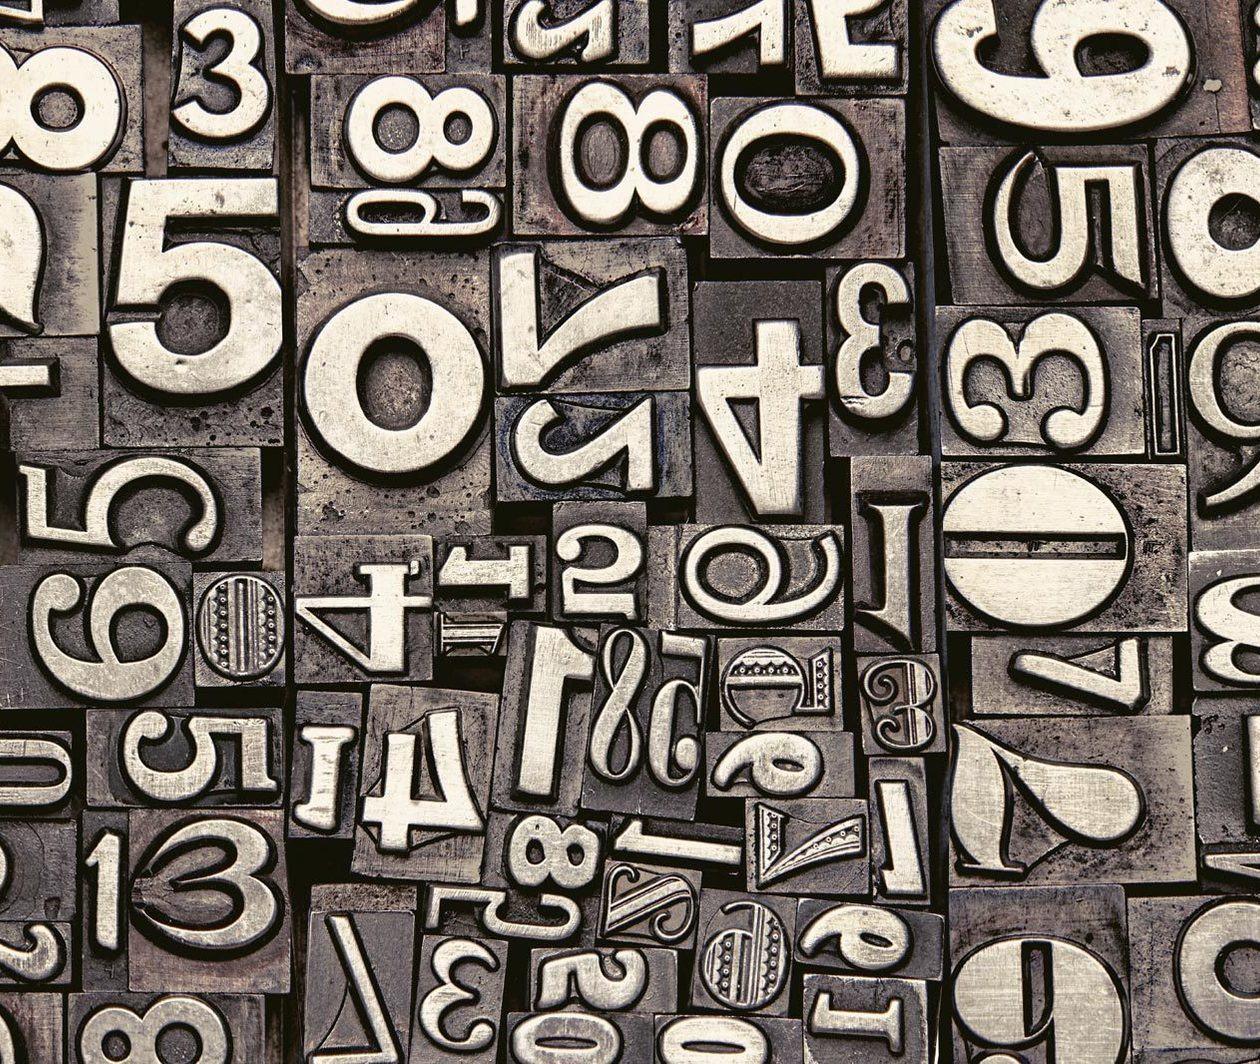 Maths Puzzles: Cryptarithms, Symbologies and Secret Codes